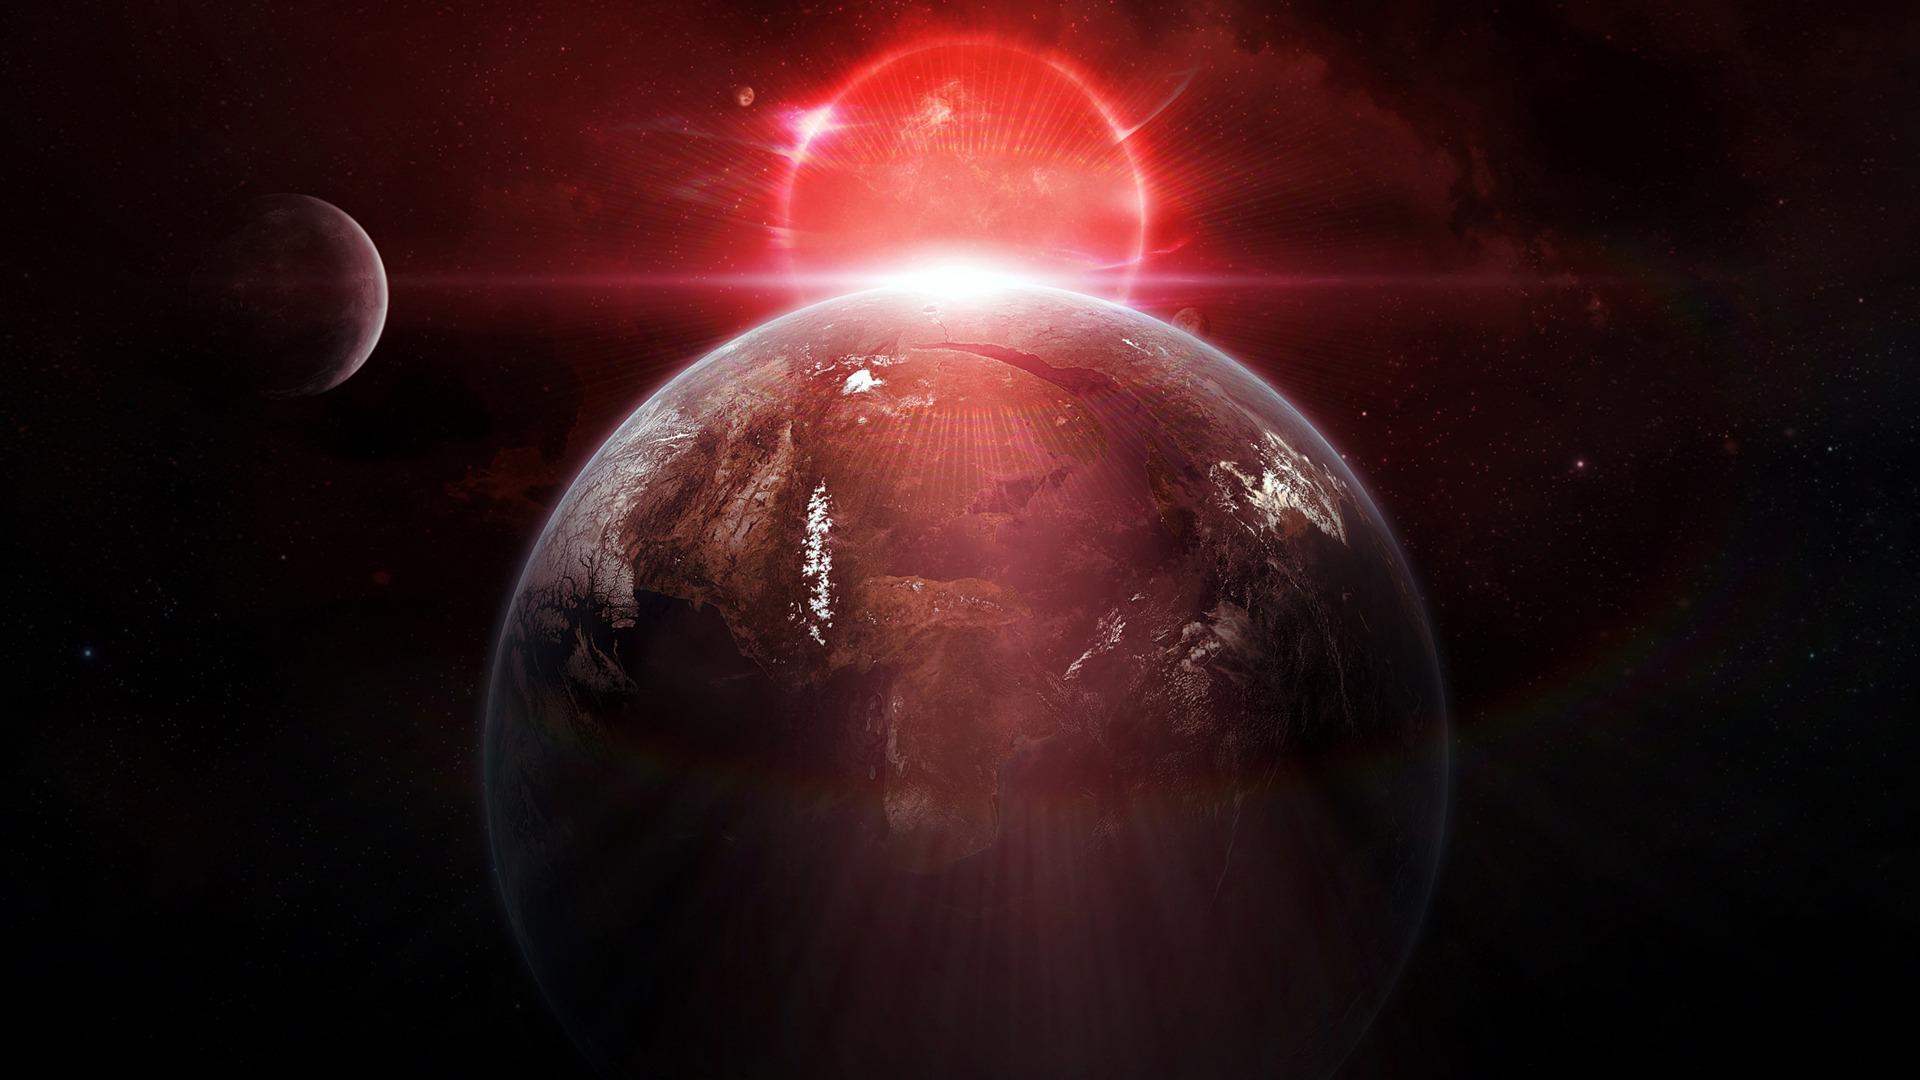 Red Sun Space Planet Universe Hd Wallpaper Preview 10wallpaper Com